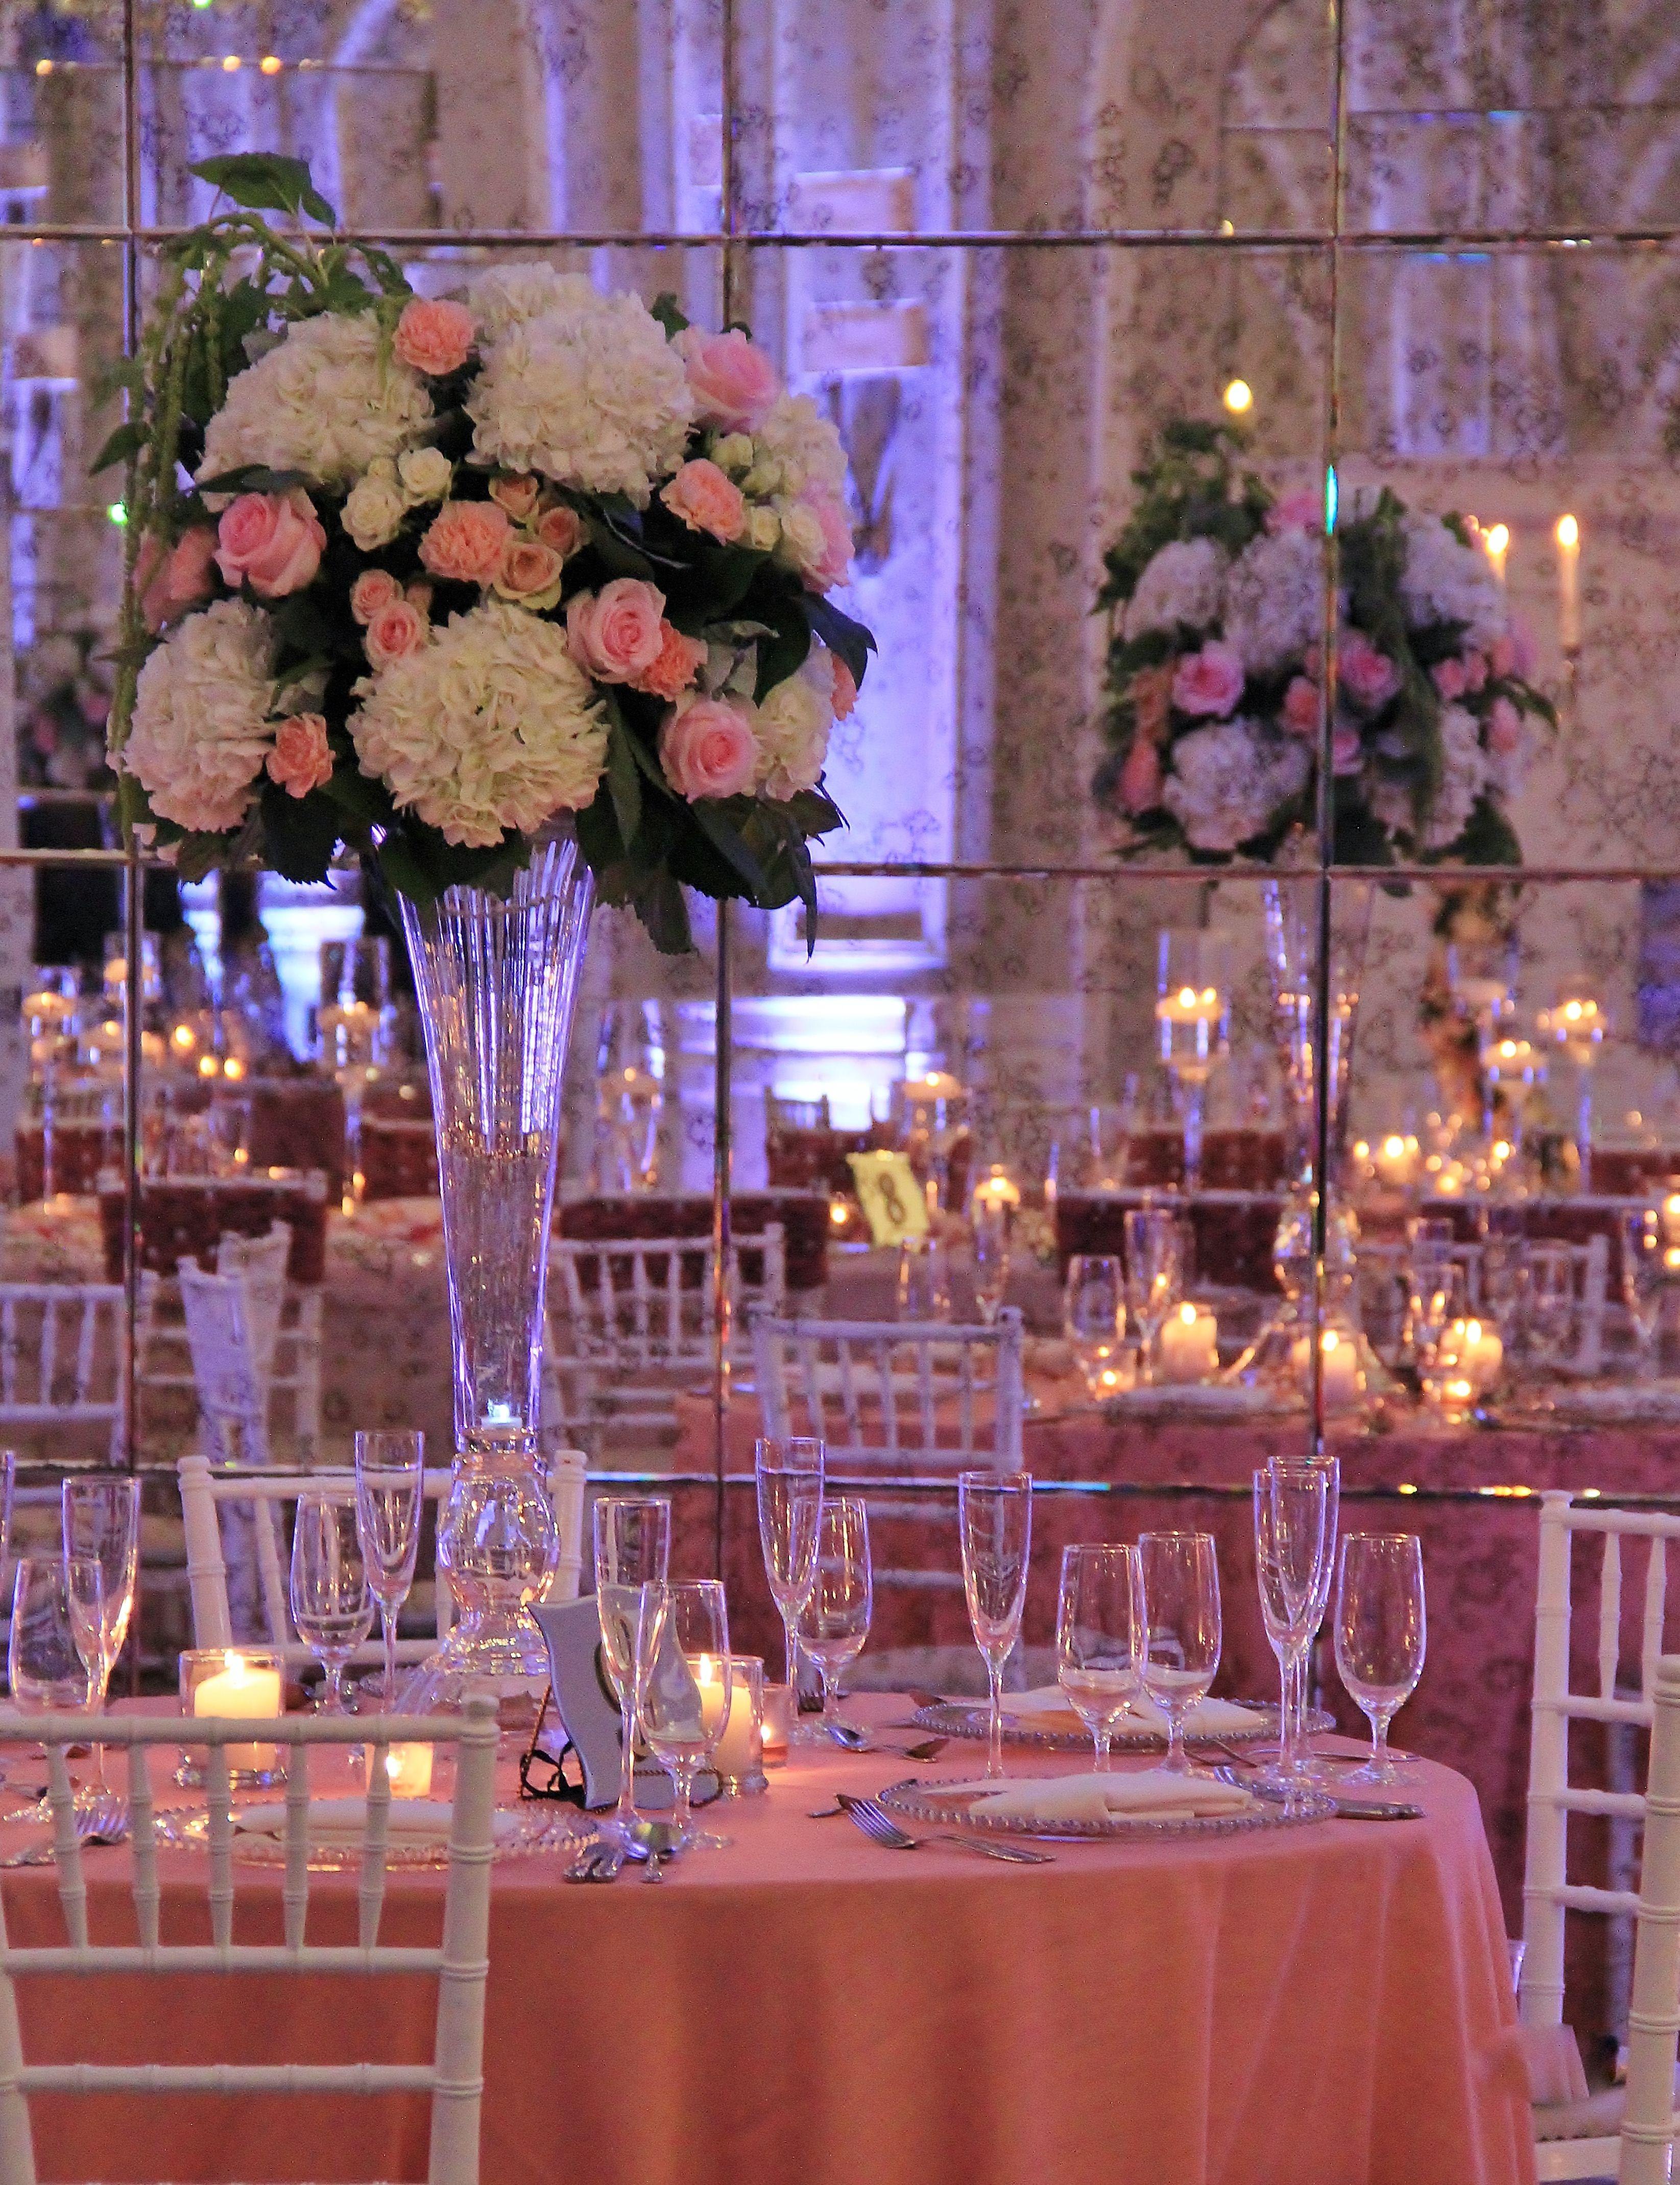 tower vases in bulk of edding centerpieces fresh gold vase stratadime throughout wedding floral centerpieces fresh trumpet vases filled at the crystal ballroom with hydrangeas spray wedding